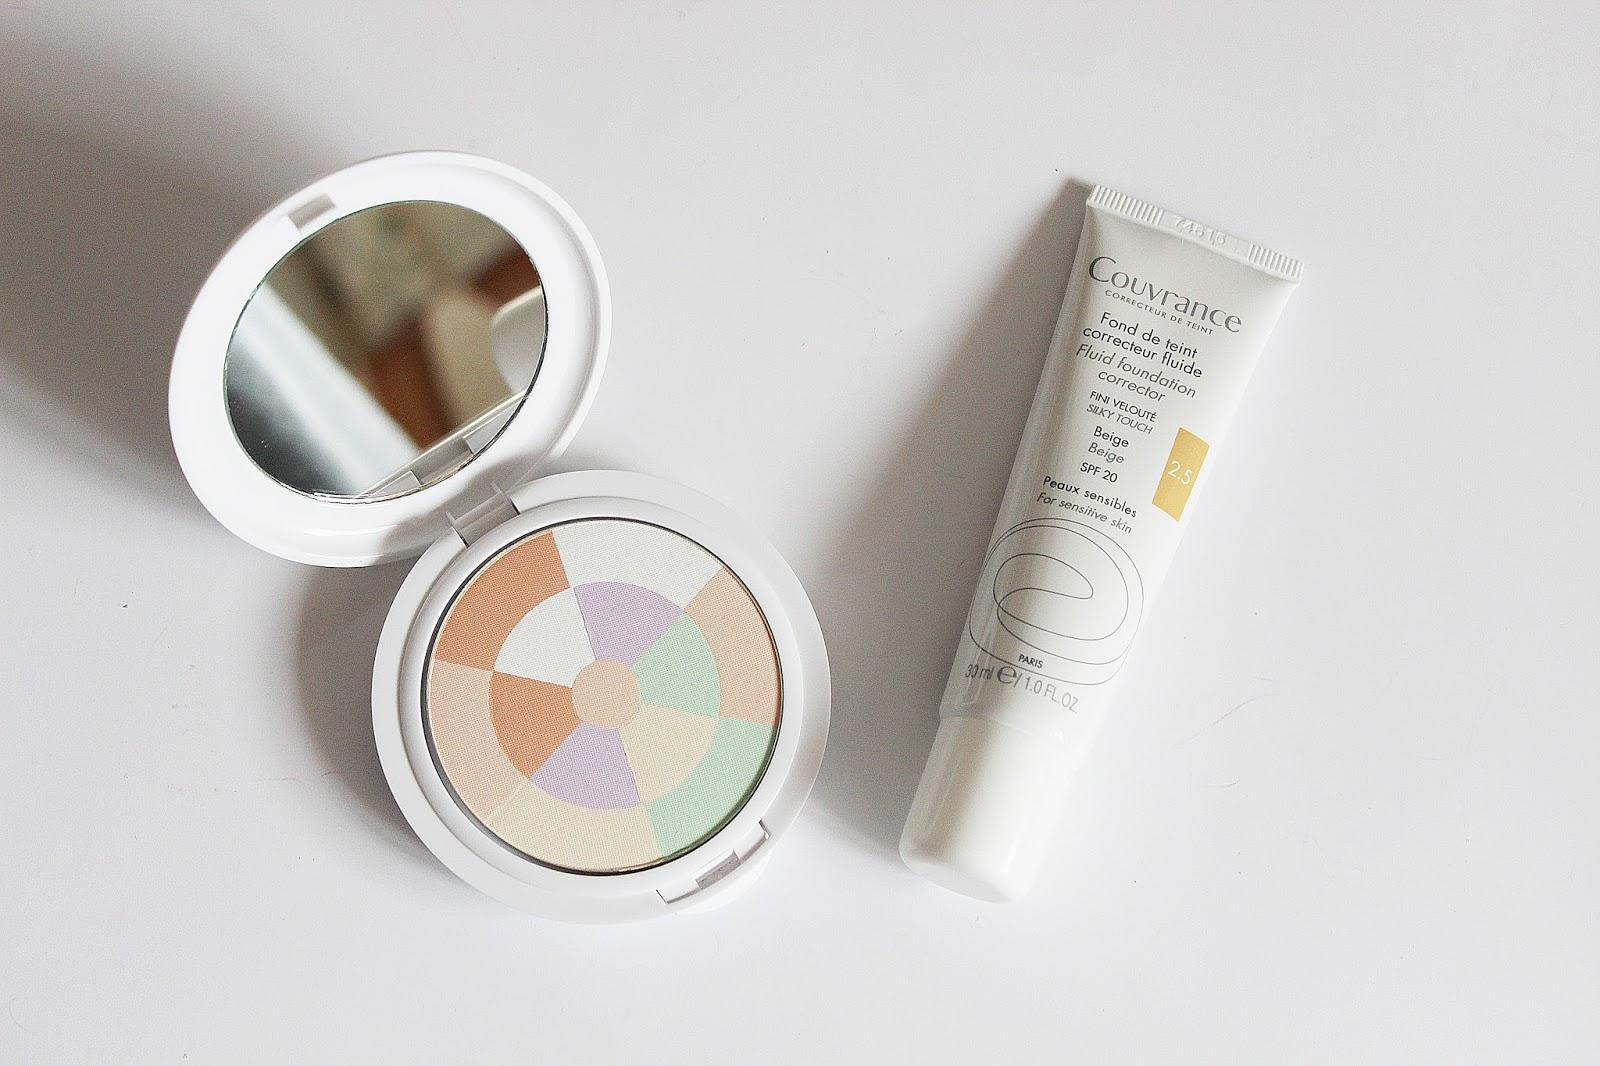 maquillaje couvrance 10 productos de belleza